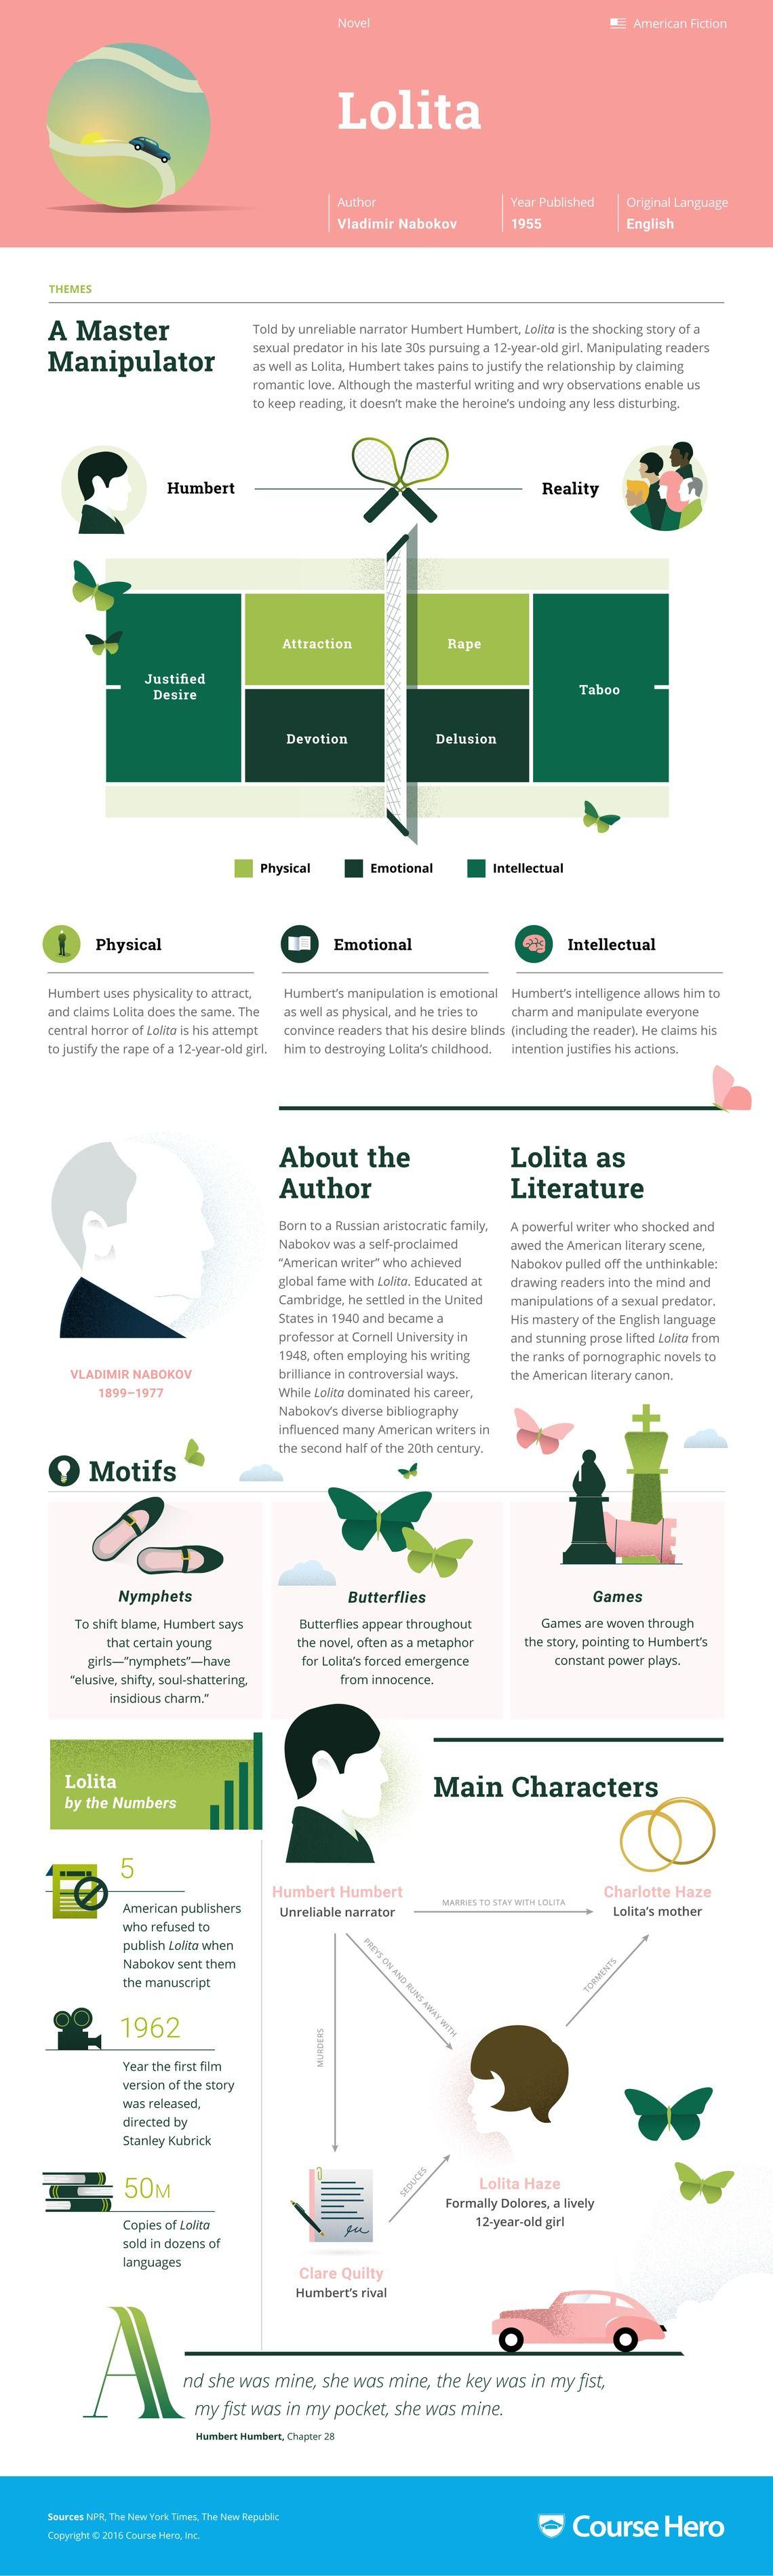 dolores lolita 越南14 Lolita Infographic | Course Hero